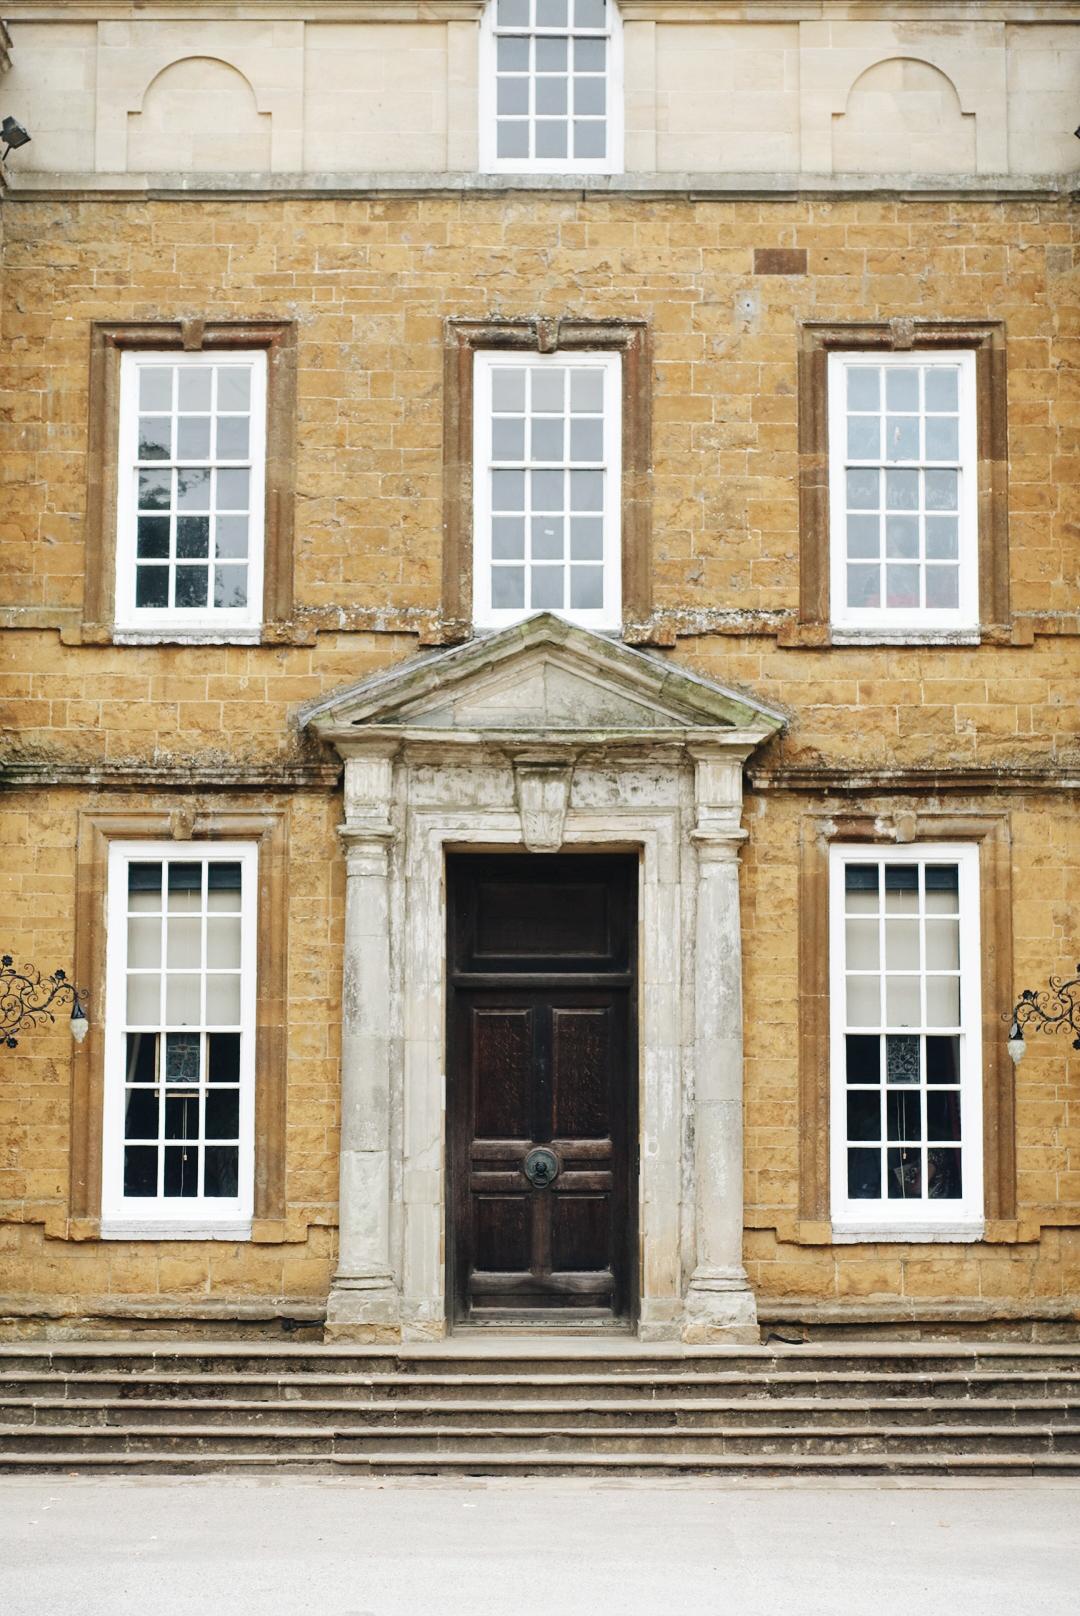 Upton House and Gardens, Warwickshire